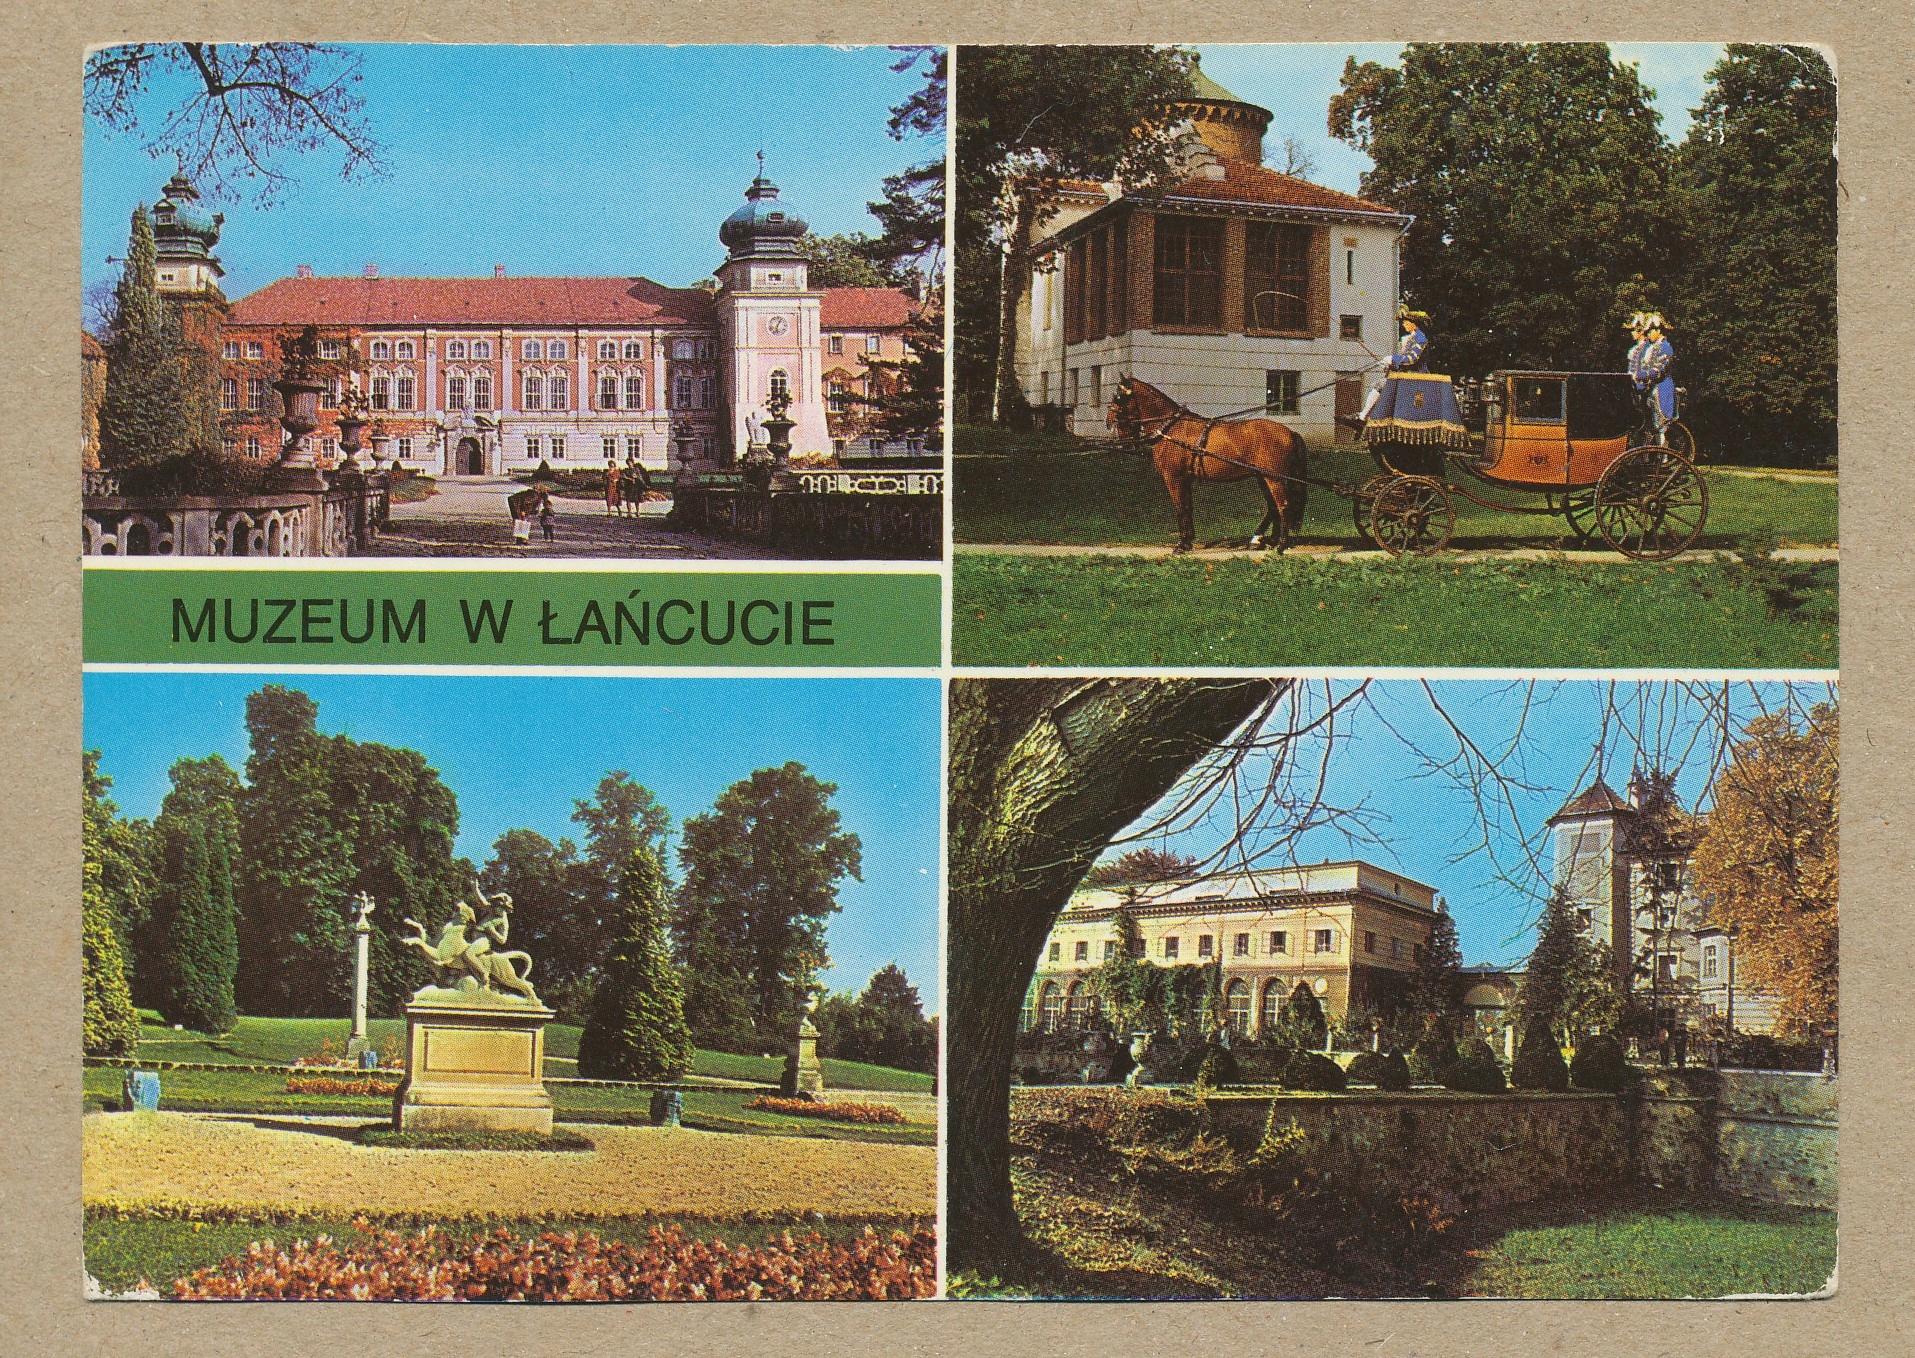 ŁAŃCUT - PAŁAC MUZEUM mix zdjęć 1980 r.